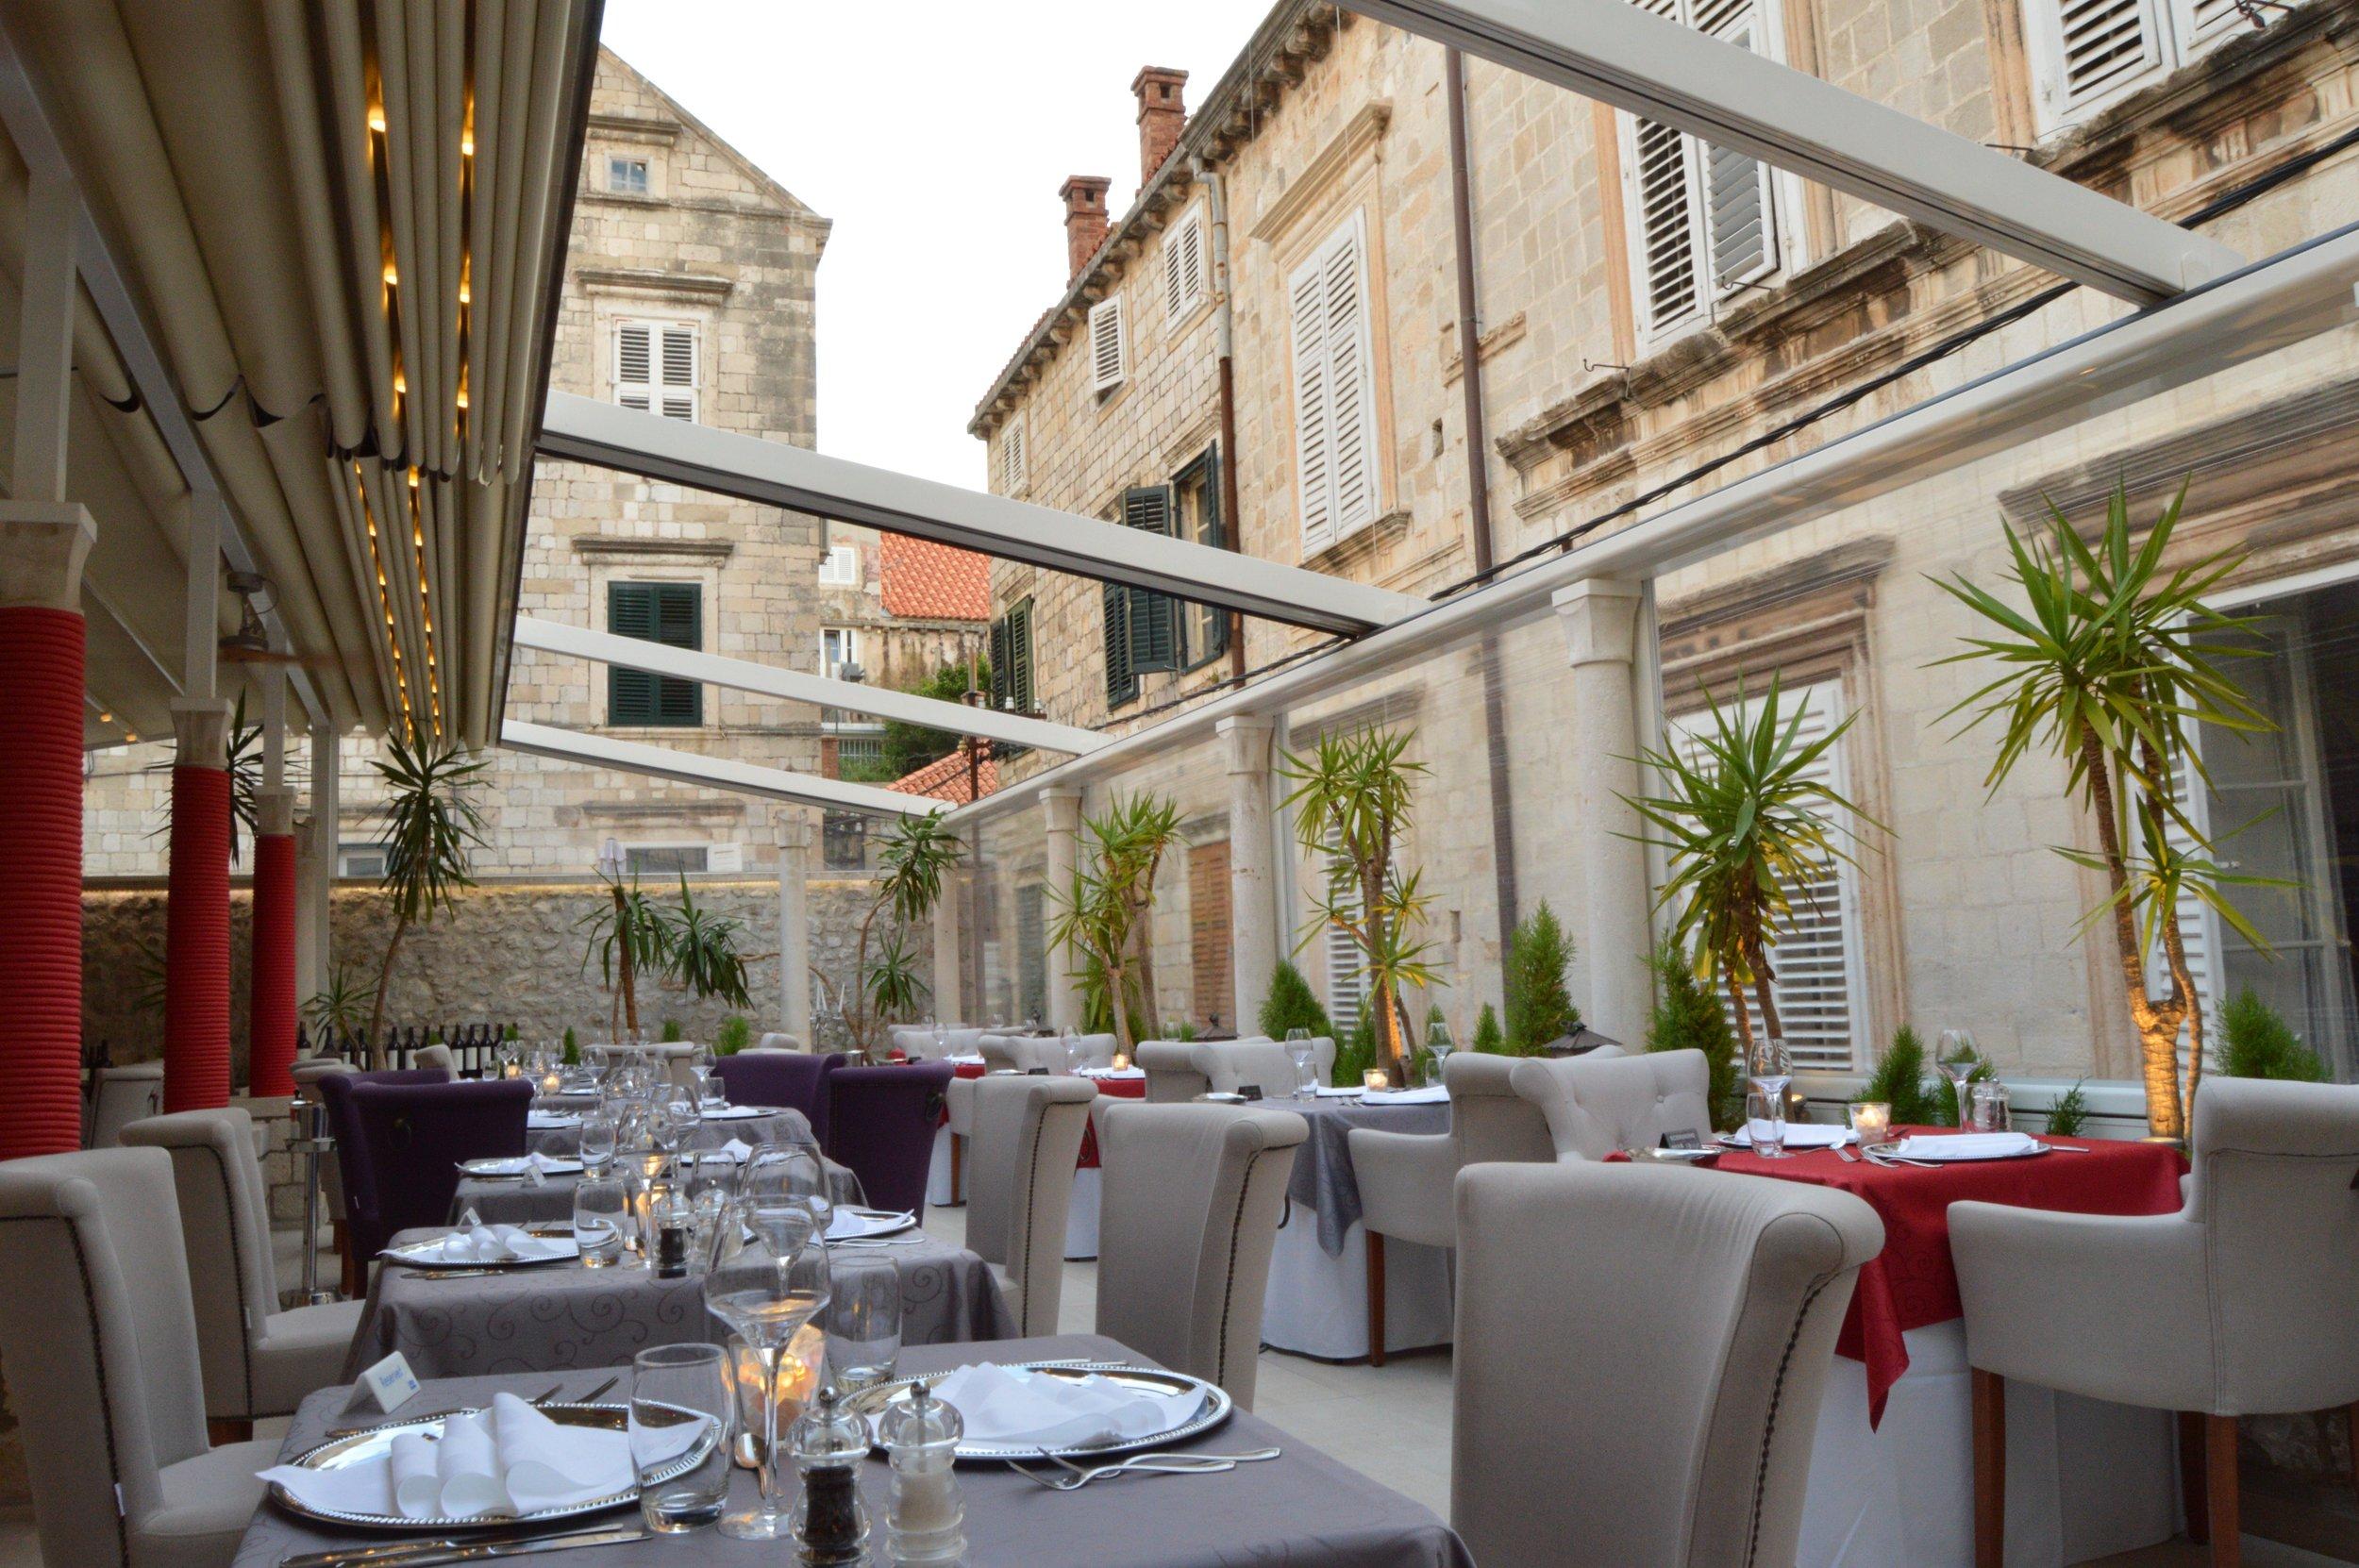 restoran dubrovnik croatia restaurants